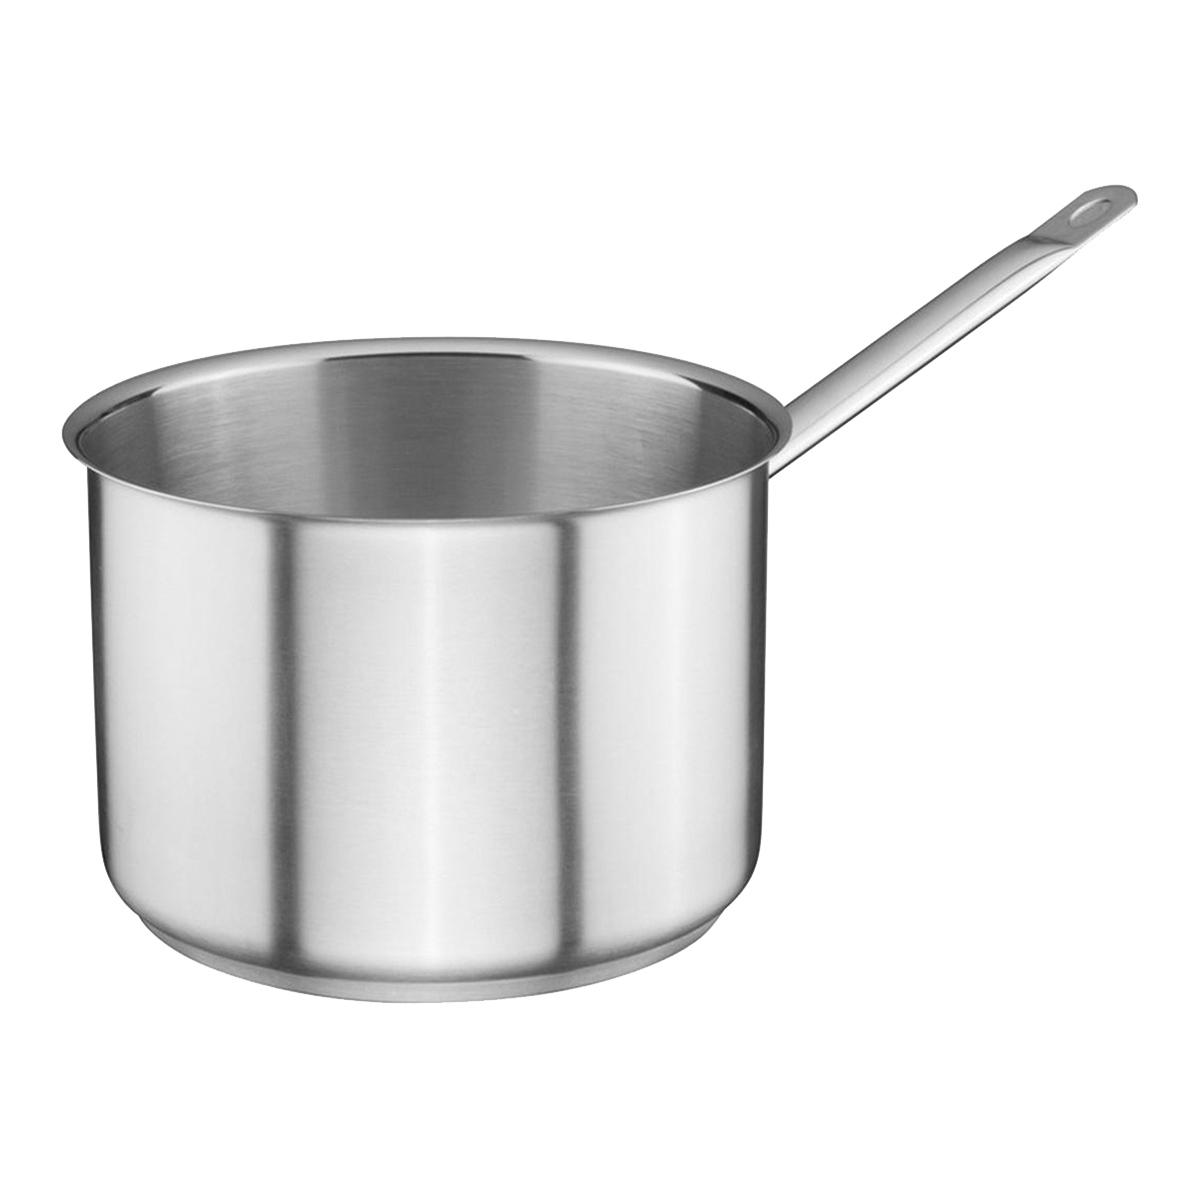 Image of   H. W. Larsen kasserolle - Oztiryakile - 3,75 liter